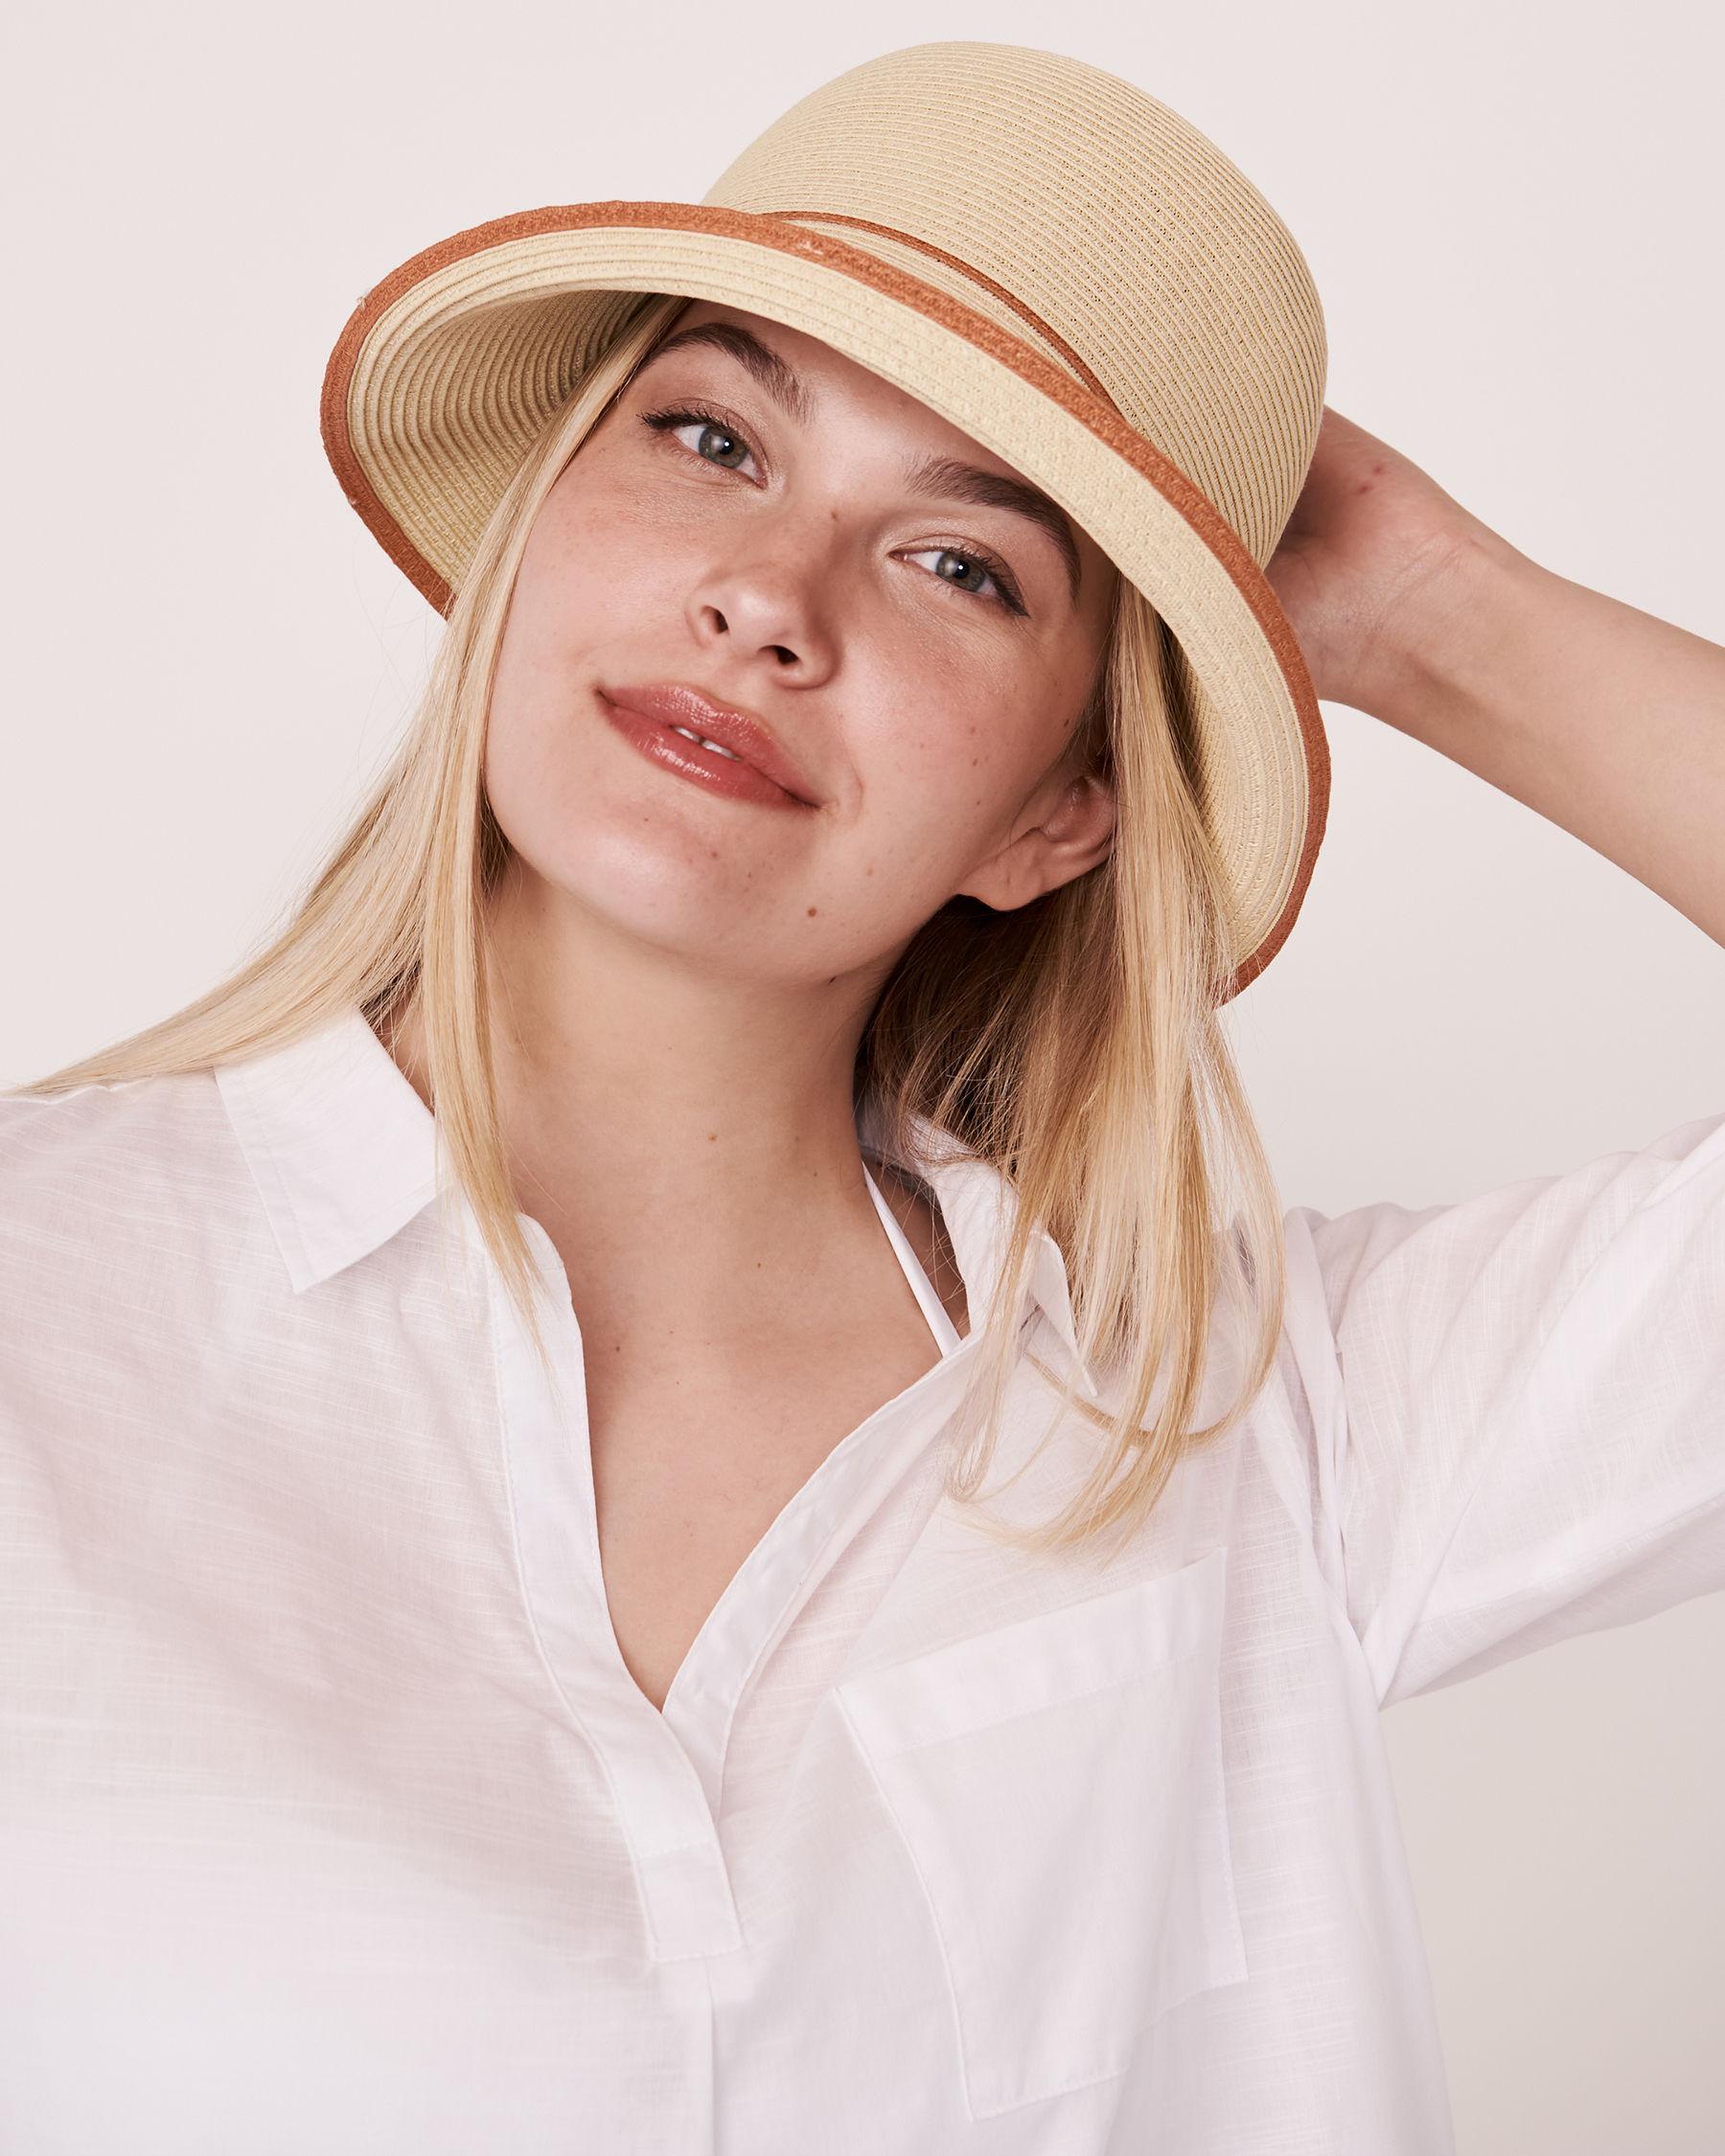 LA VIE EN ROSE AQUA Contrasting Cloche Hat Sand 80500033 - View1